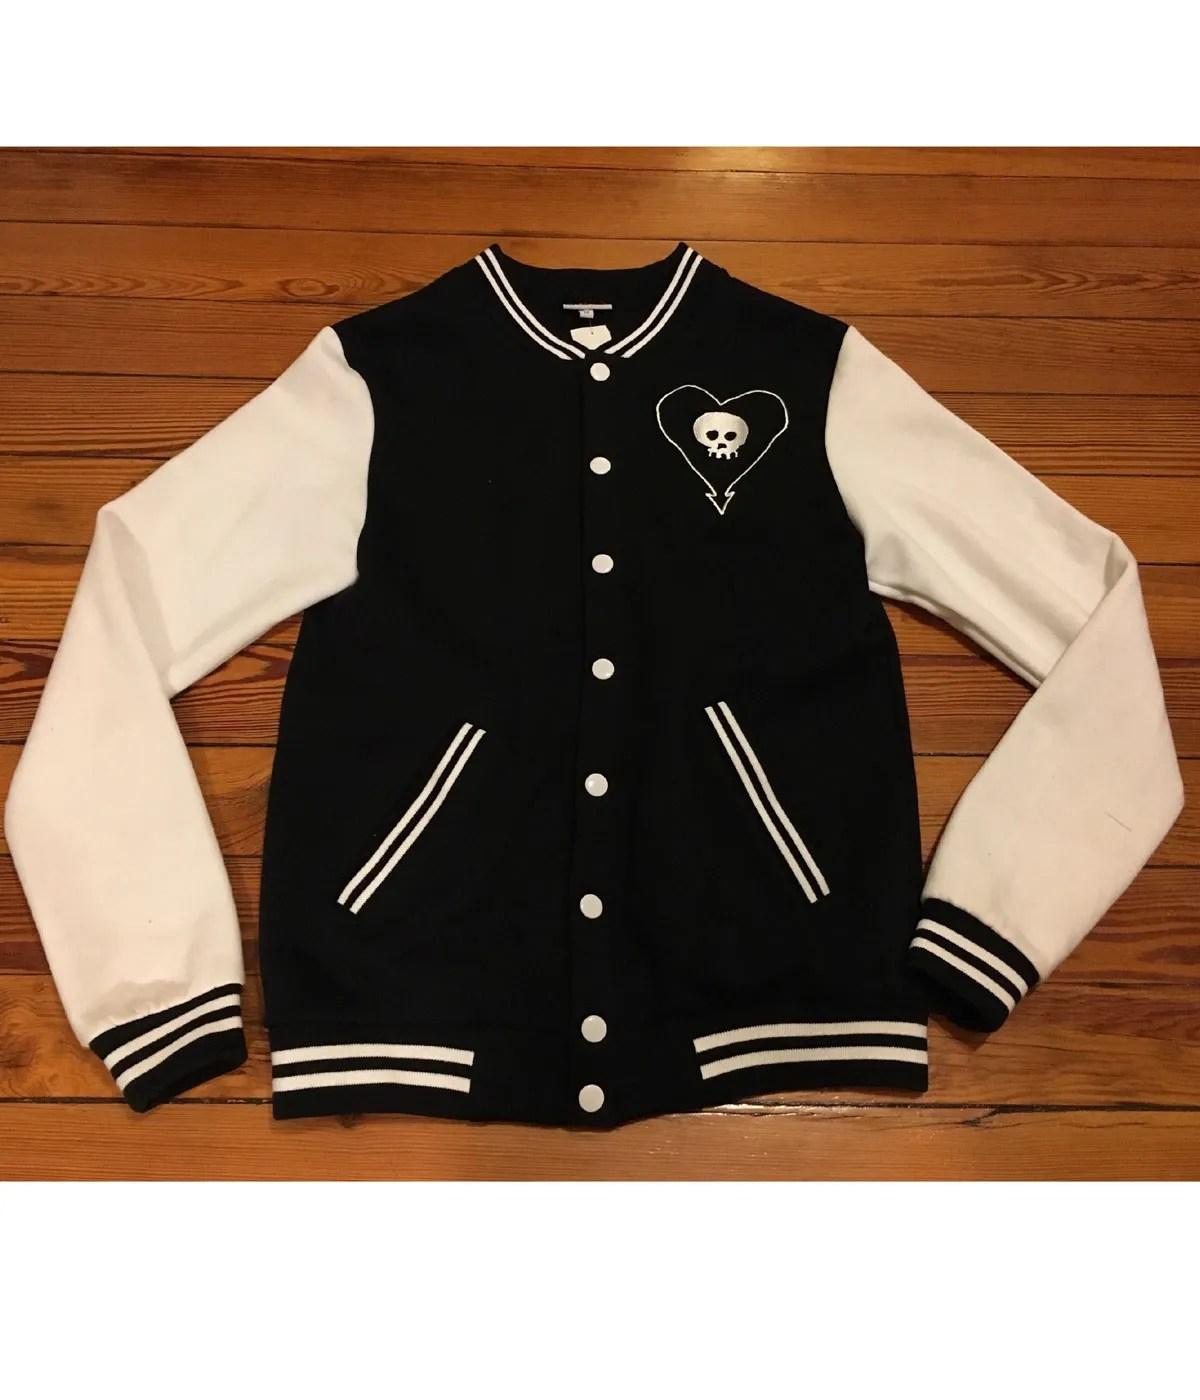 alkaline-trio-letterman-jacket